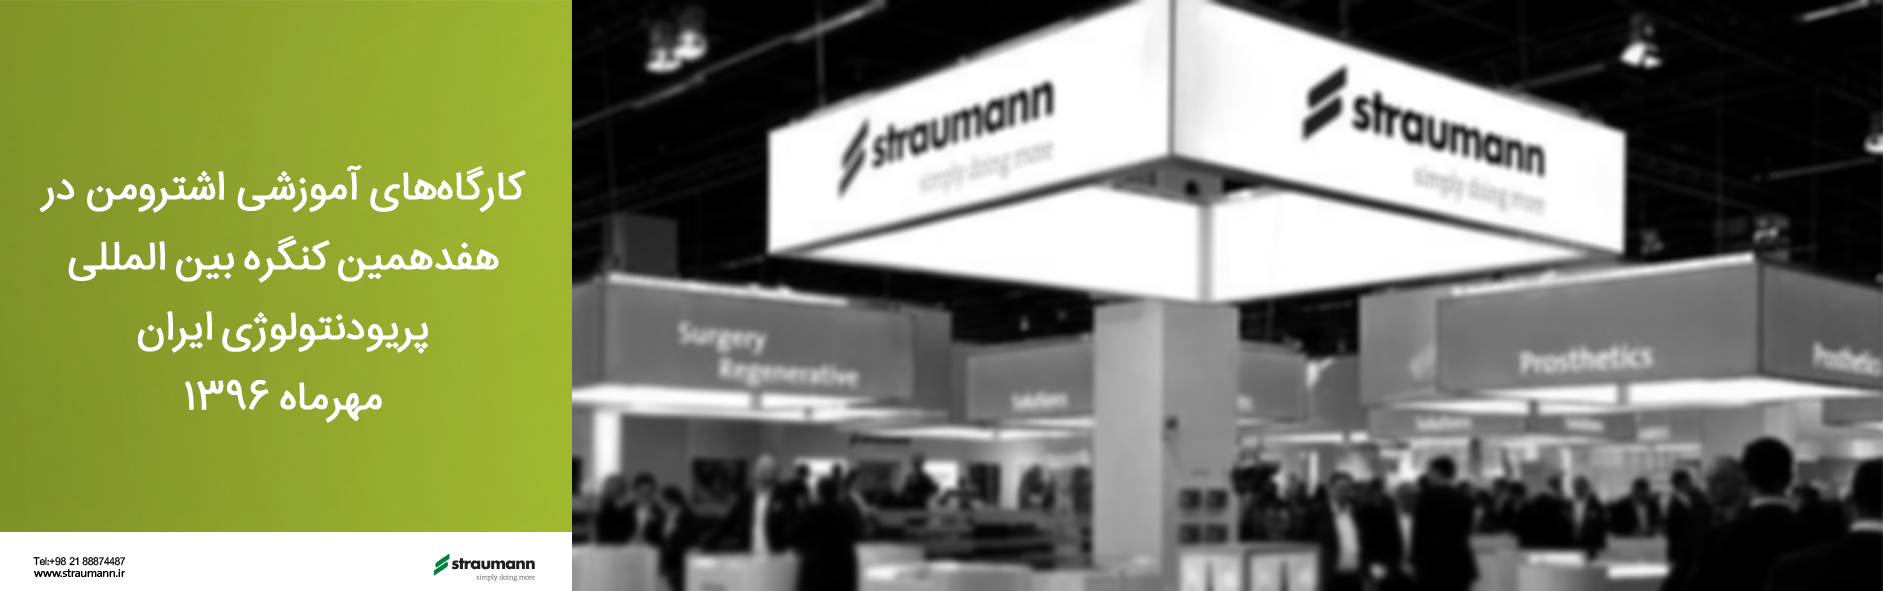 شرکت اشترومن (Straumann)